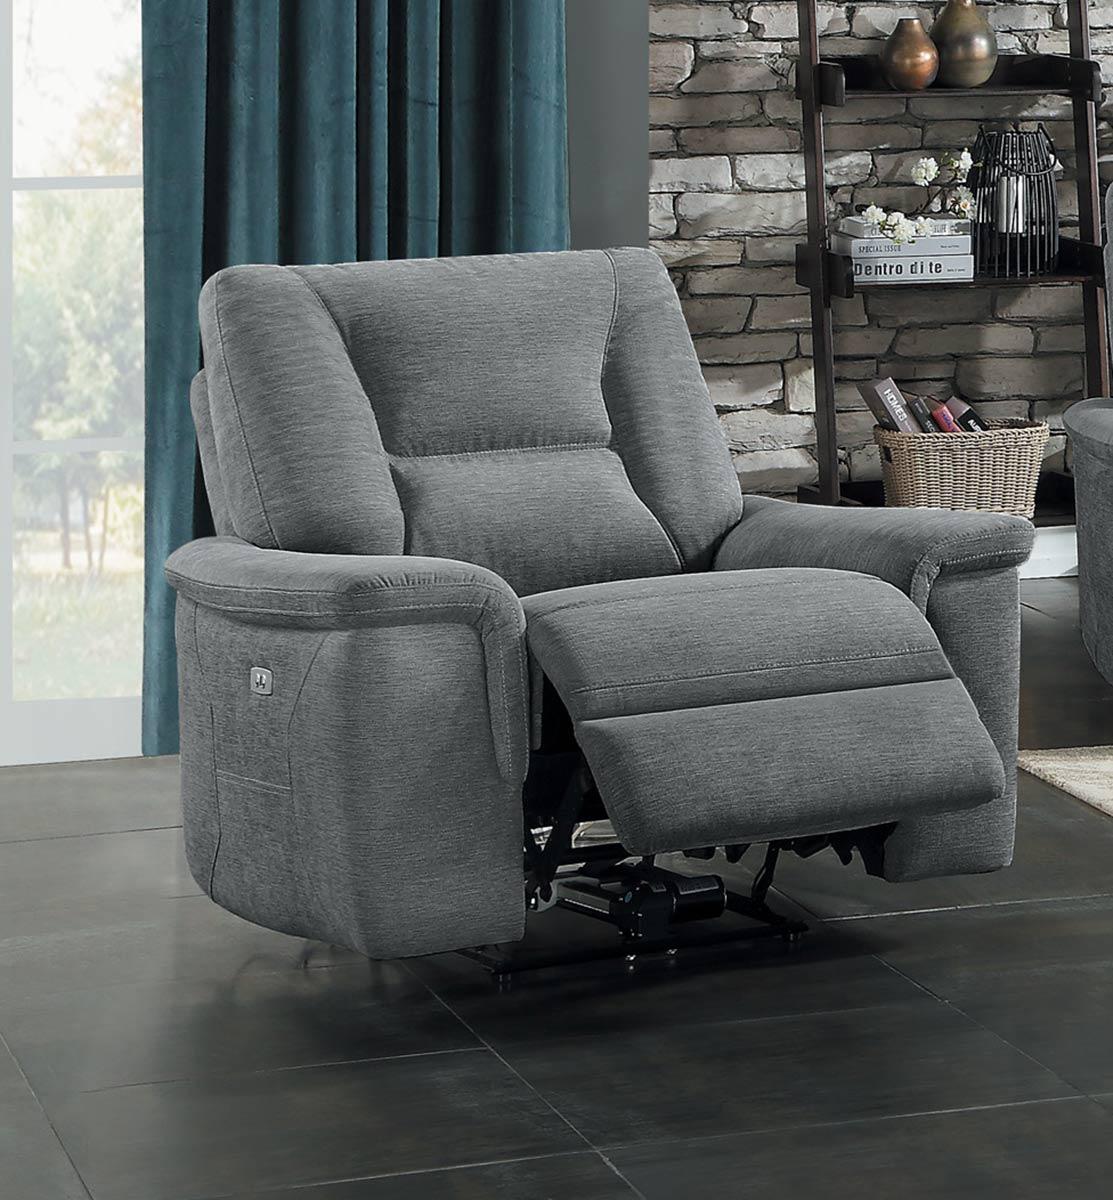 Homelegance Edelweiss Reclining Chair - Metal gray